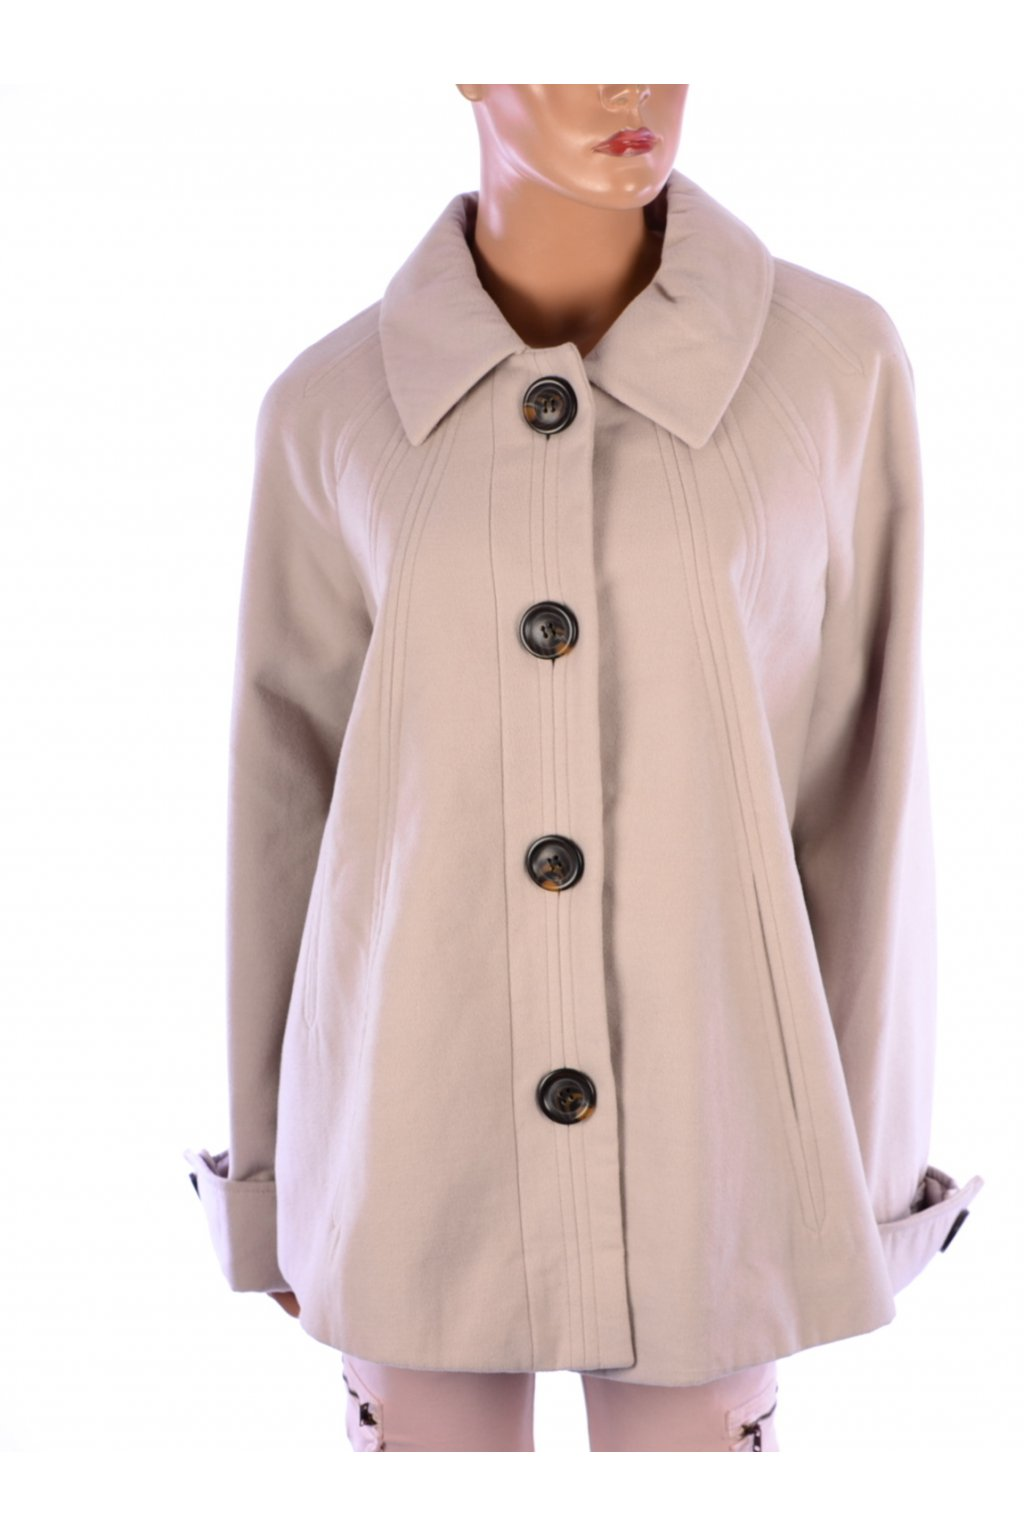 Kabát béžový Classics podzim zima vel. L - XL / uk 18